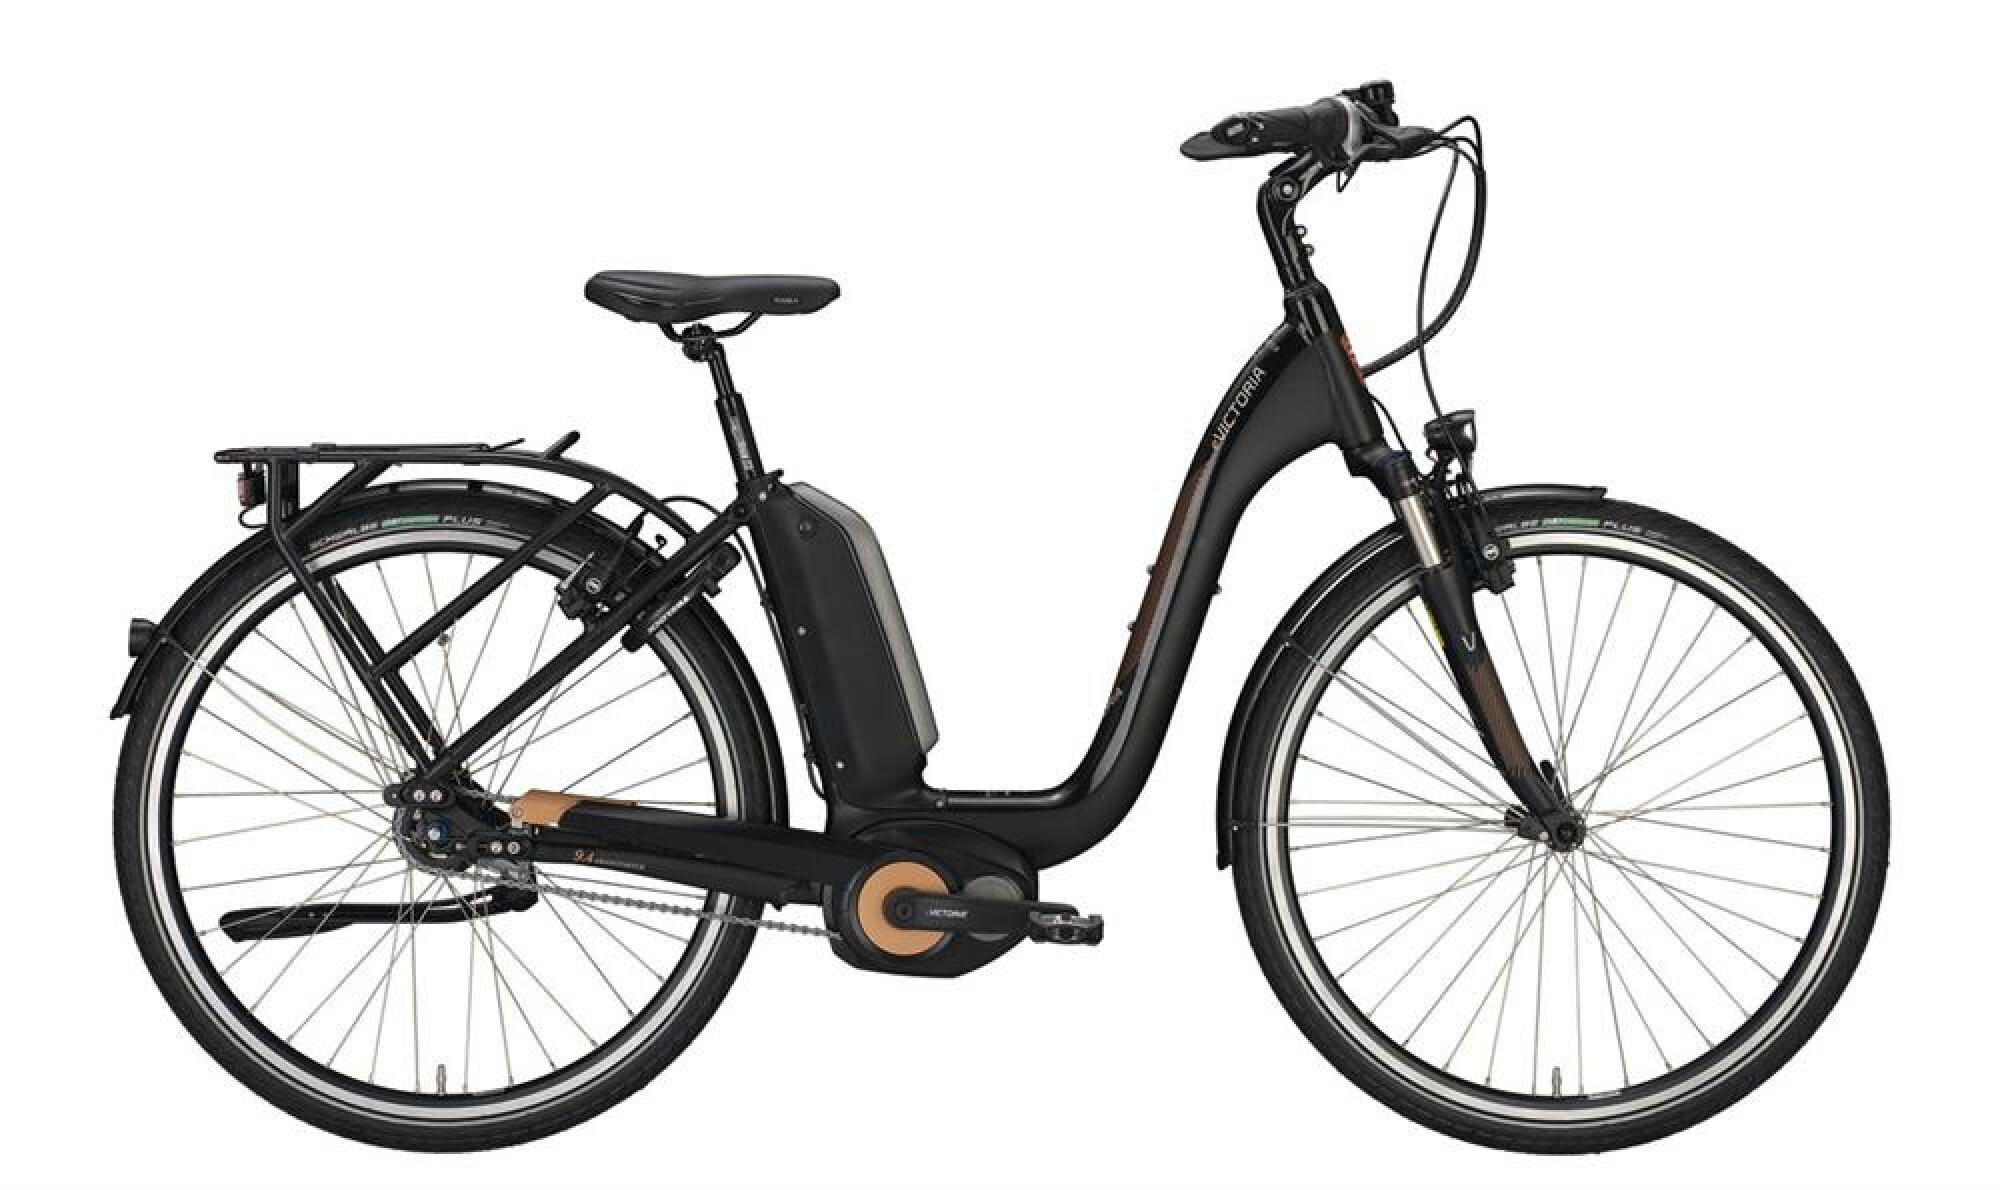 e bike victoria e manufaktur 9 4 2016 bei alle details und spezifikationen. Black Bedroom Furniture Sets. Home Design Ideas